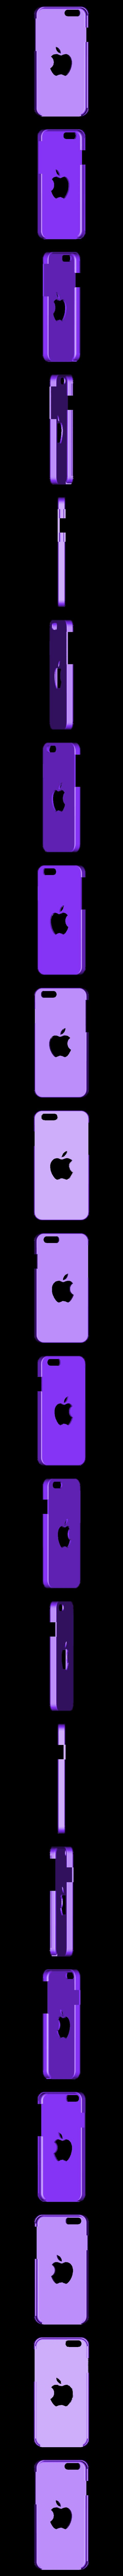 iphone_6.stl Download STL file iphone 6 case • 3D printable template, Seb0031